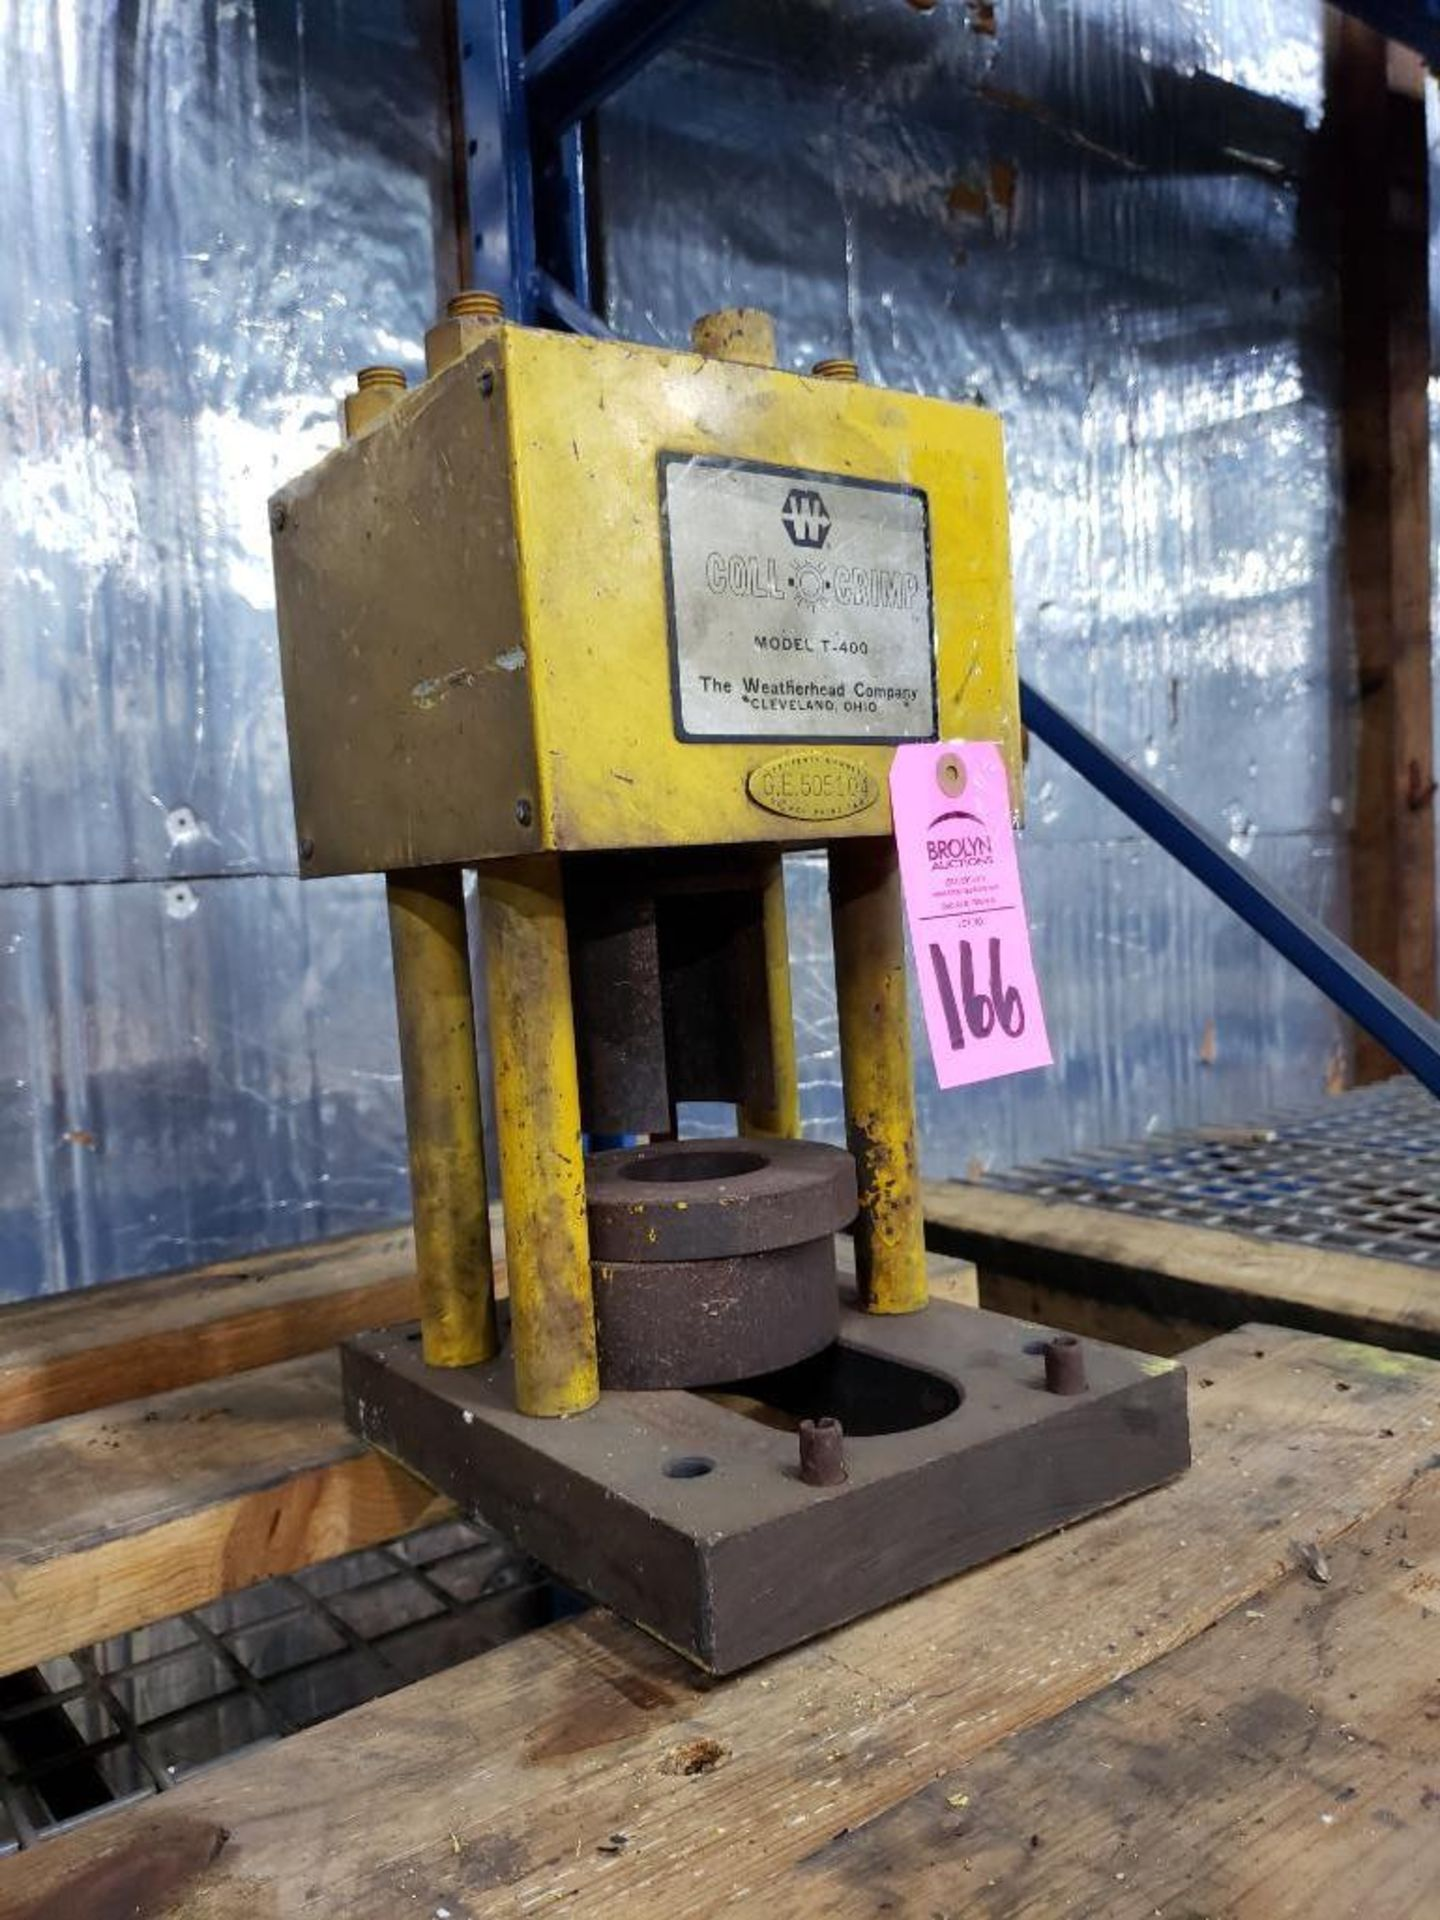 Lot 166 - Weatherhead Coll-O-Crimp model T-400 crimping machine.